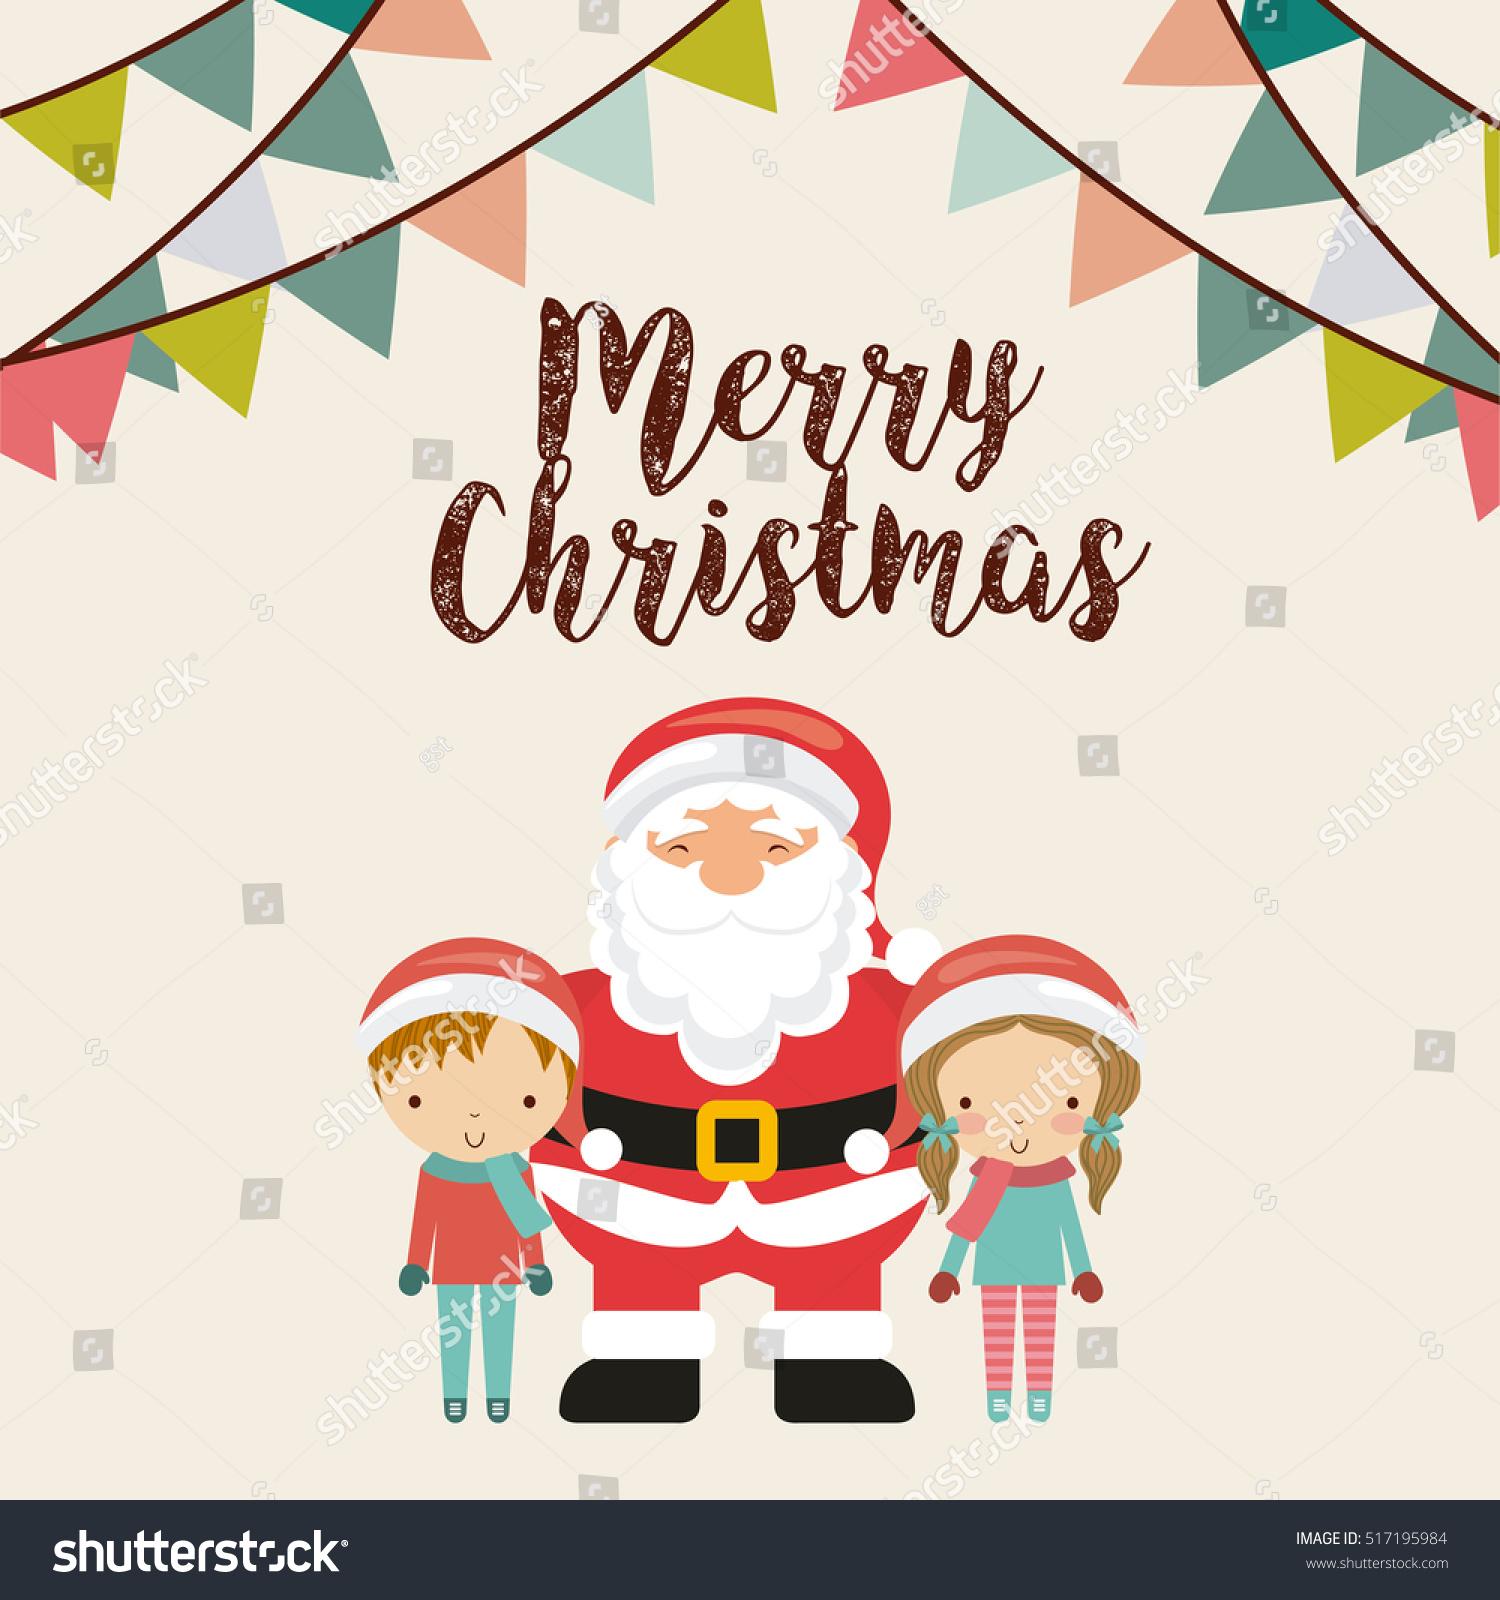 Merry Christmas Card Cartoon Santa Claus Stock Vector (Royalty Free ...